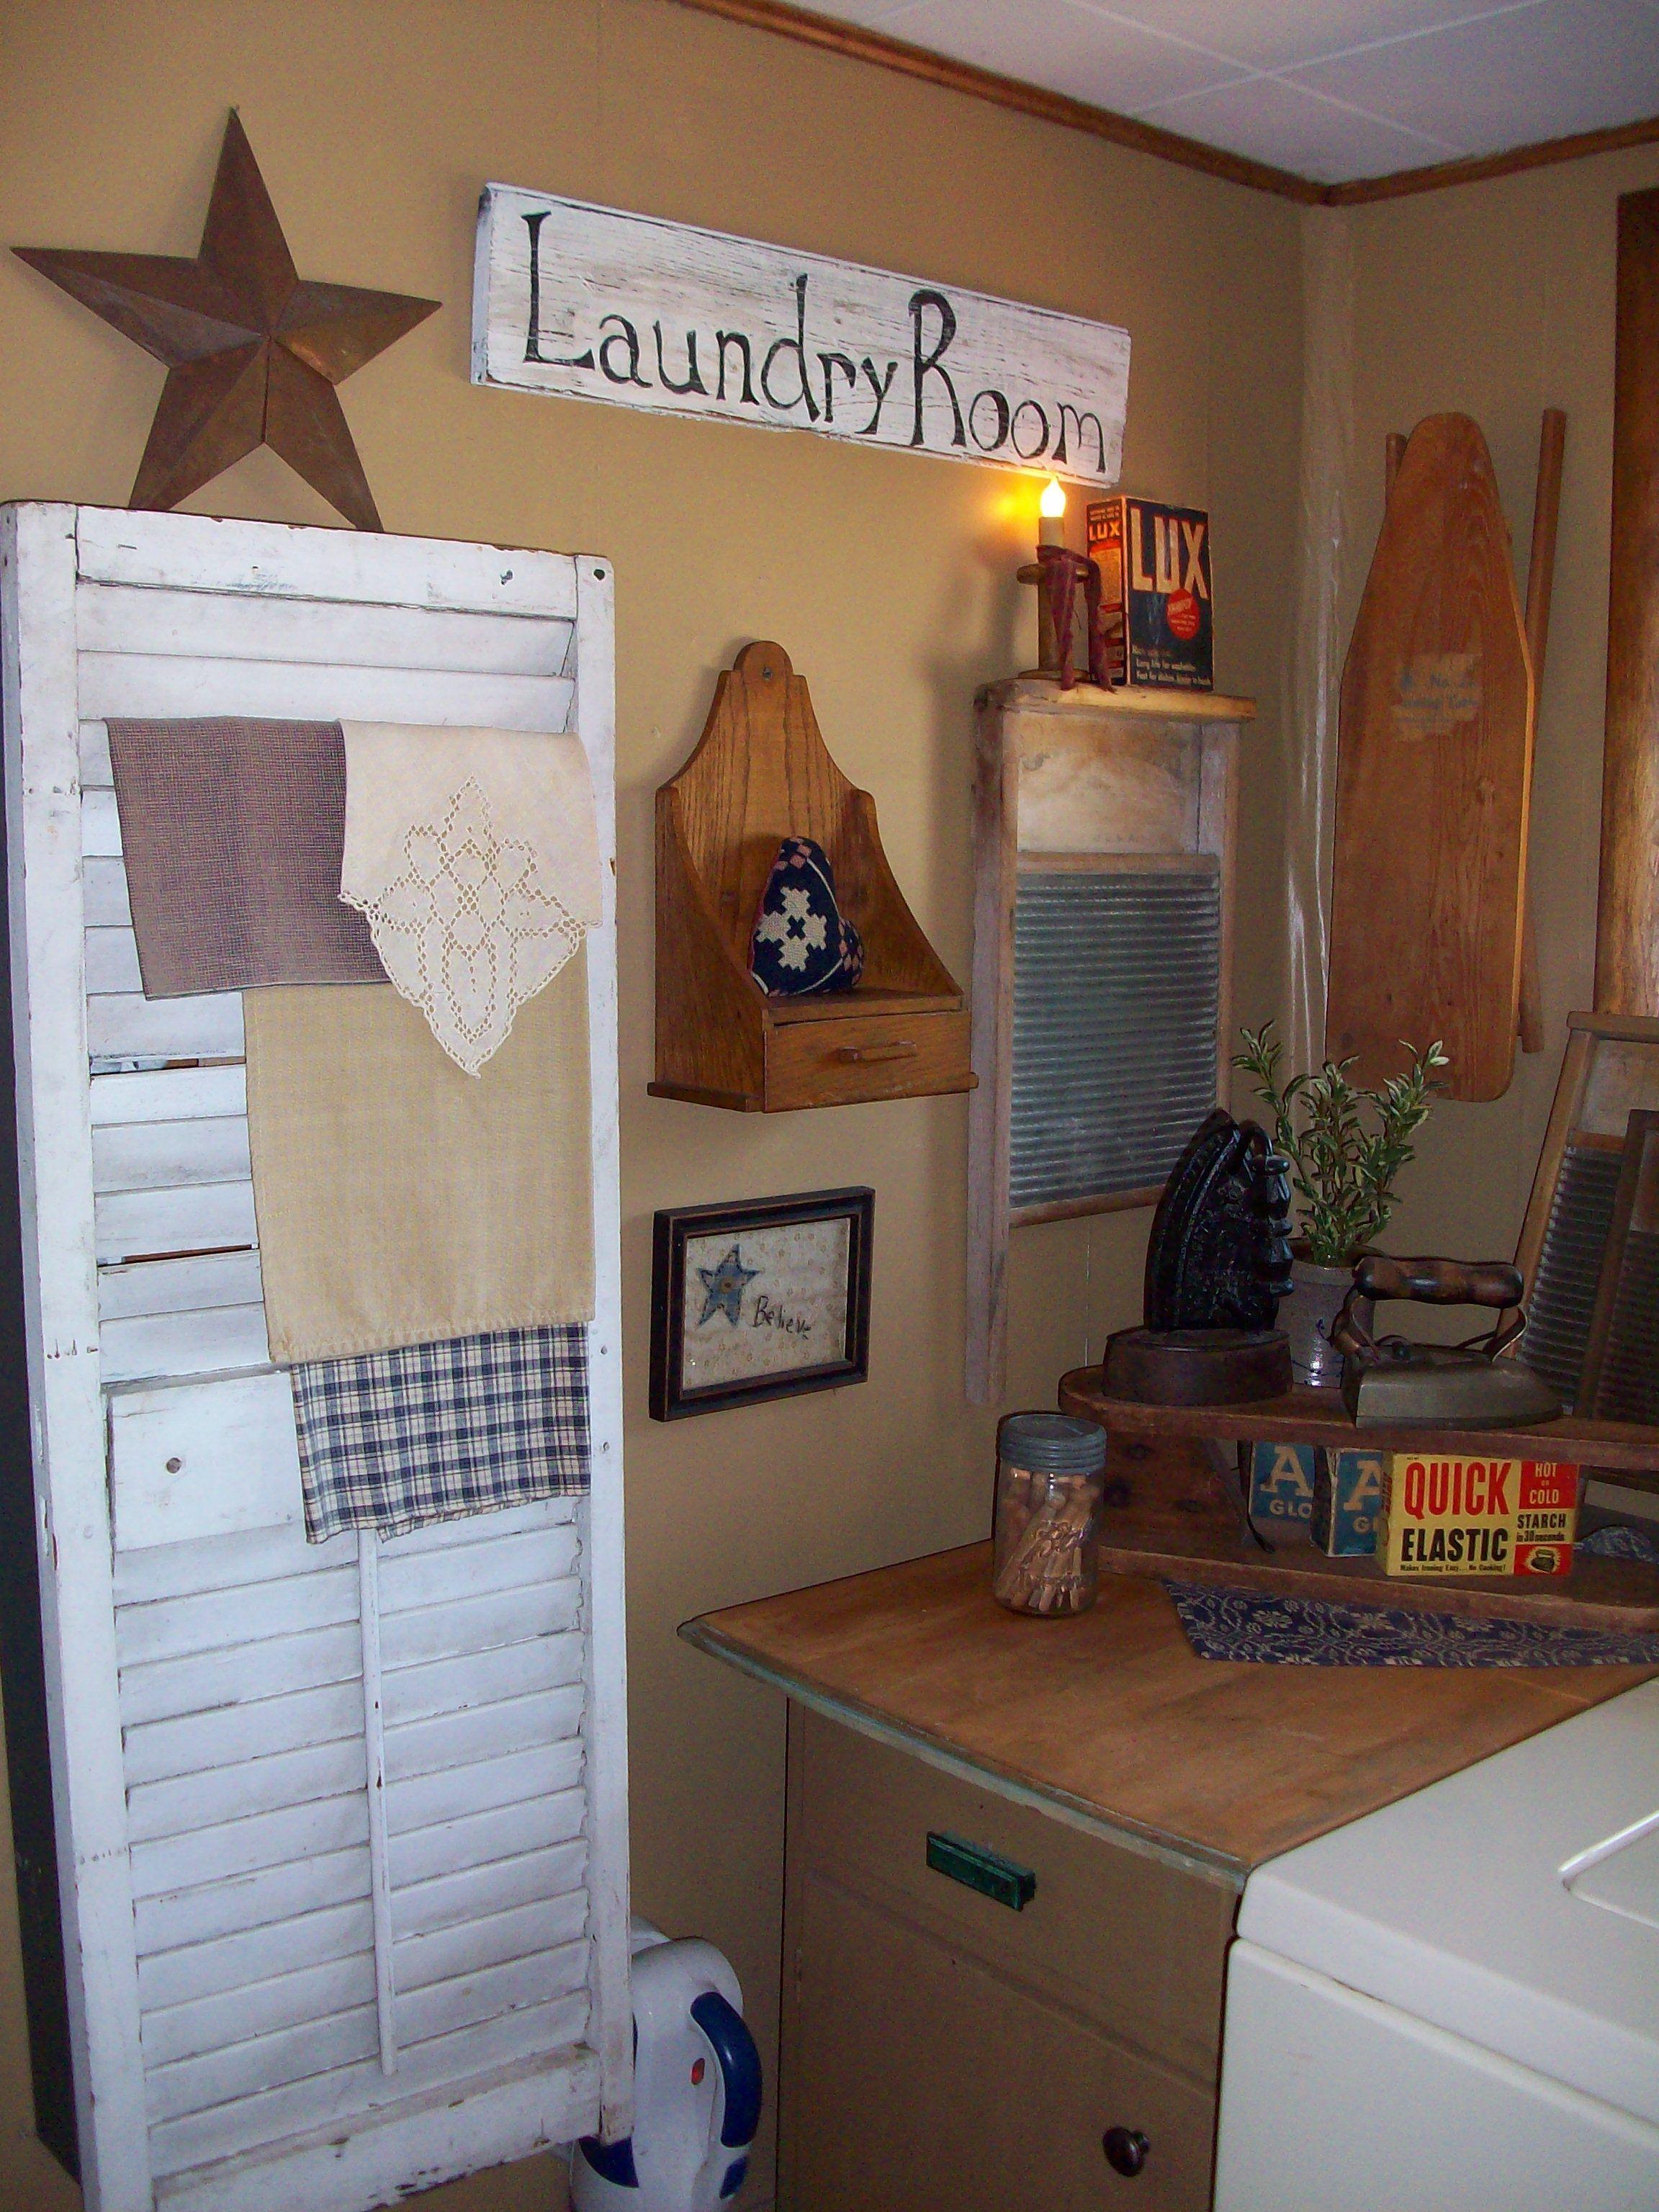 Laundry Room Laundry Room Decor Primitive Laundry Rooms Vintage Laundry Room